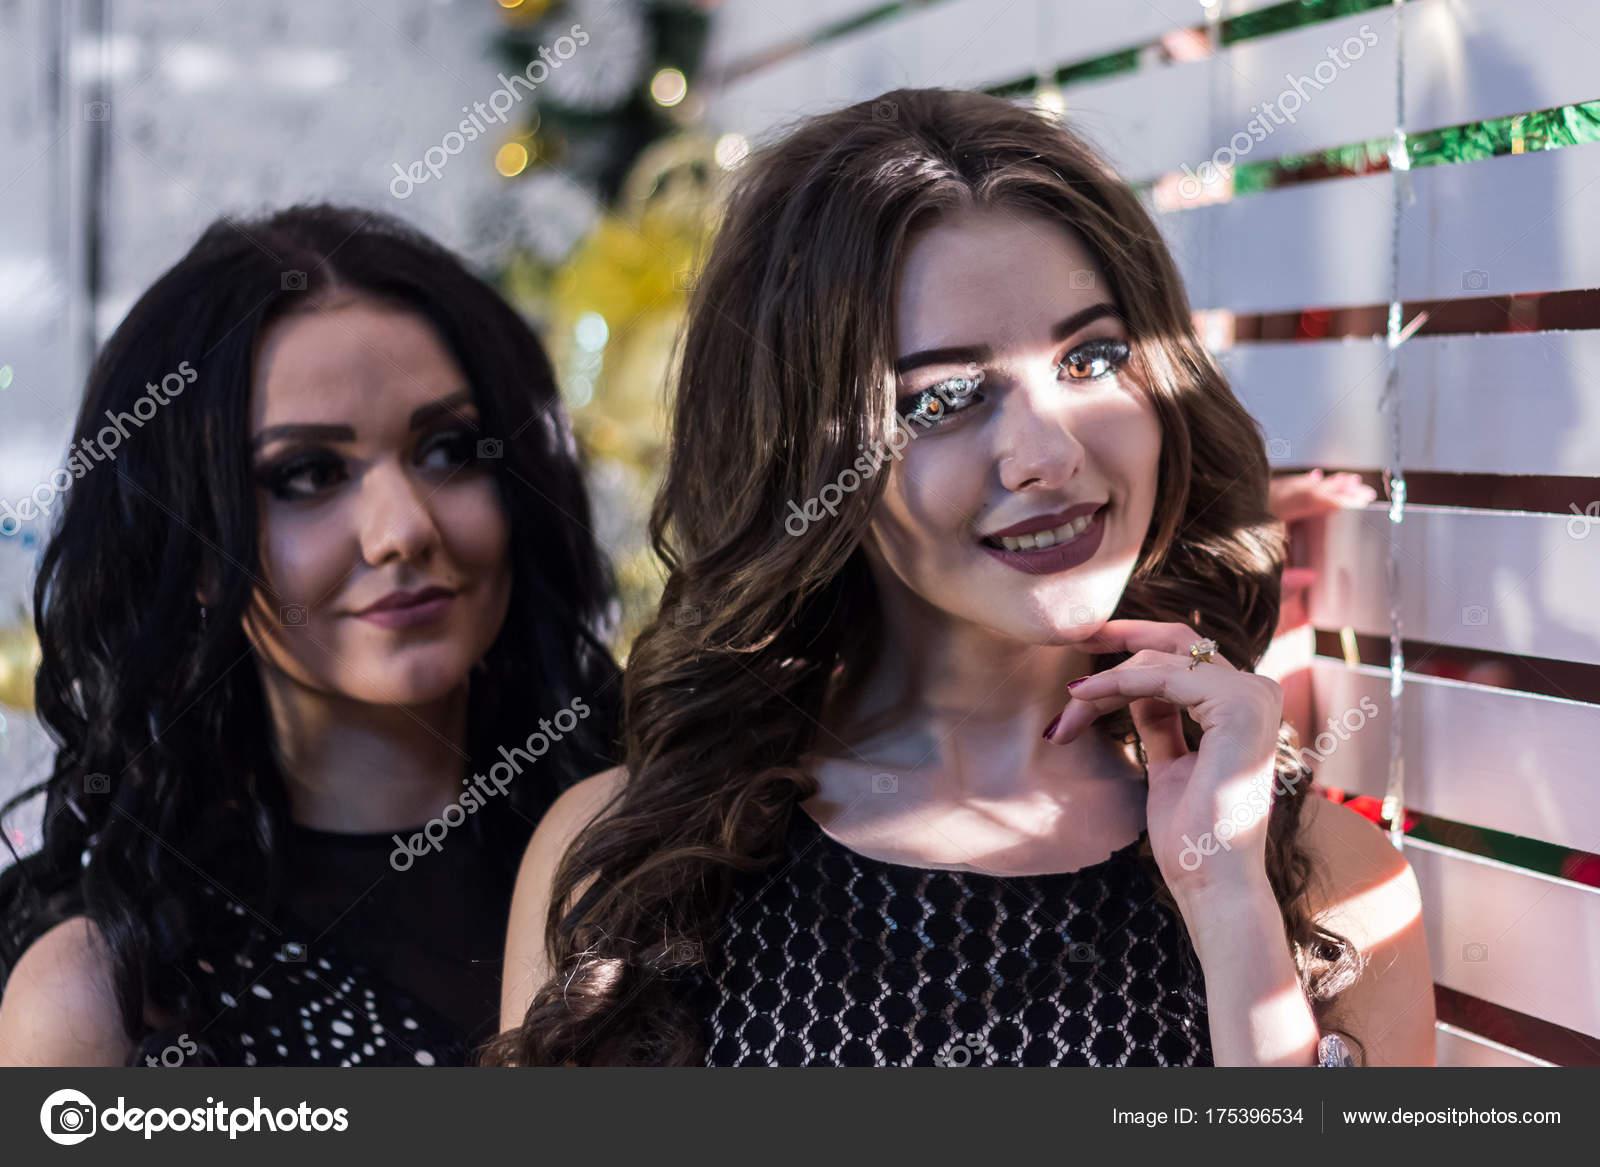 513fe504f789 Δύο όμορφα κορίτσια σε μαύρο βραδινά φορέματα κοντά σε ένα λευκό ...